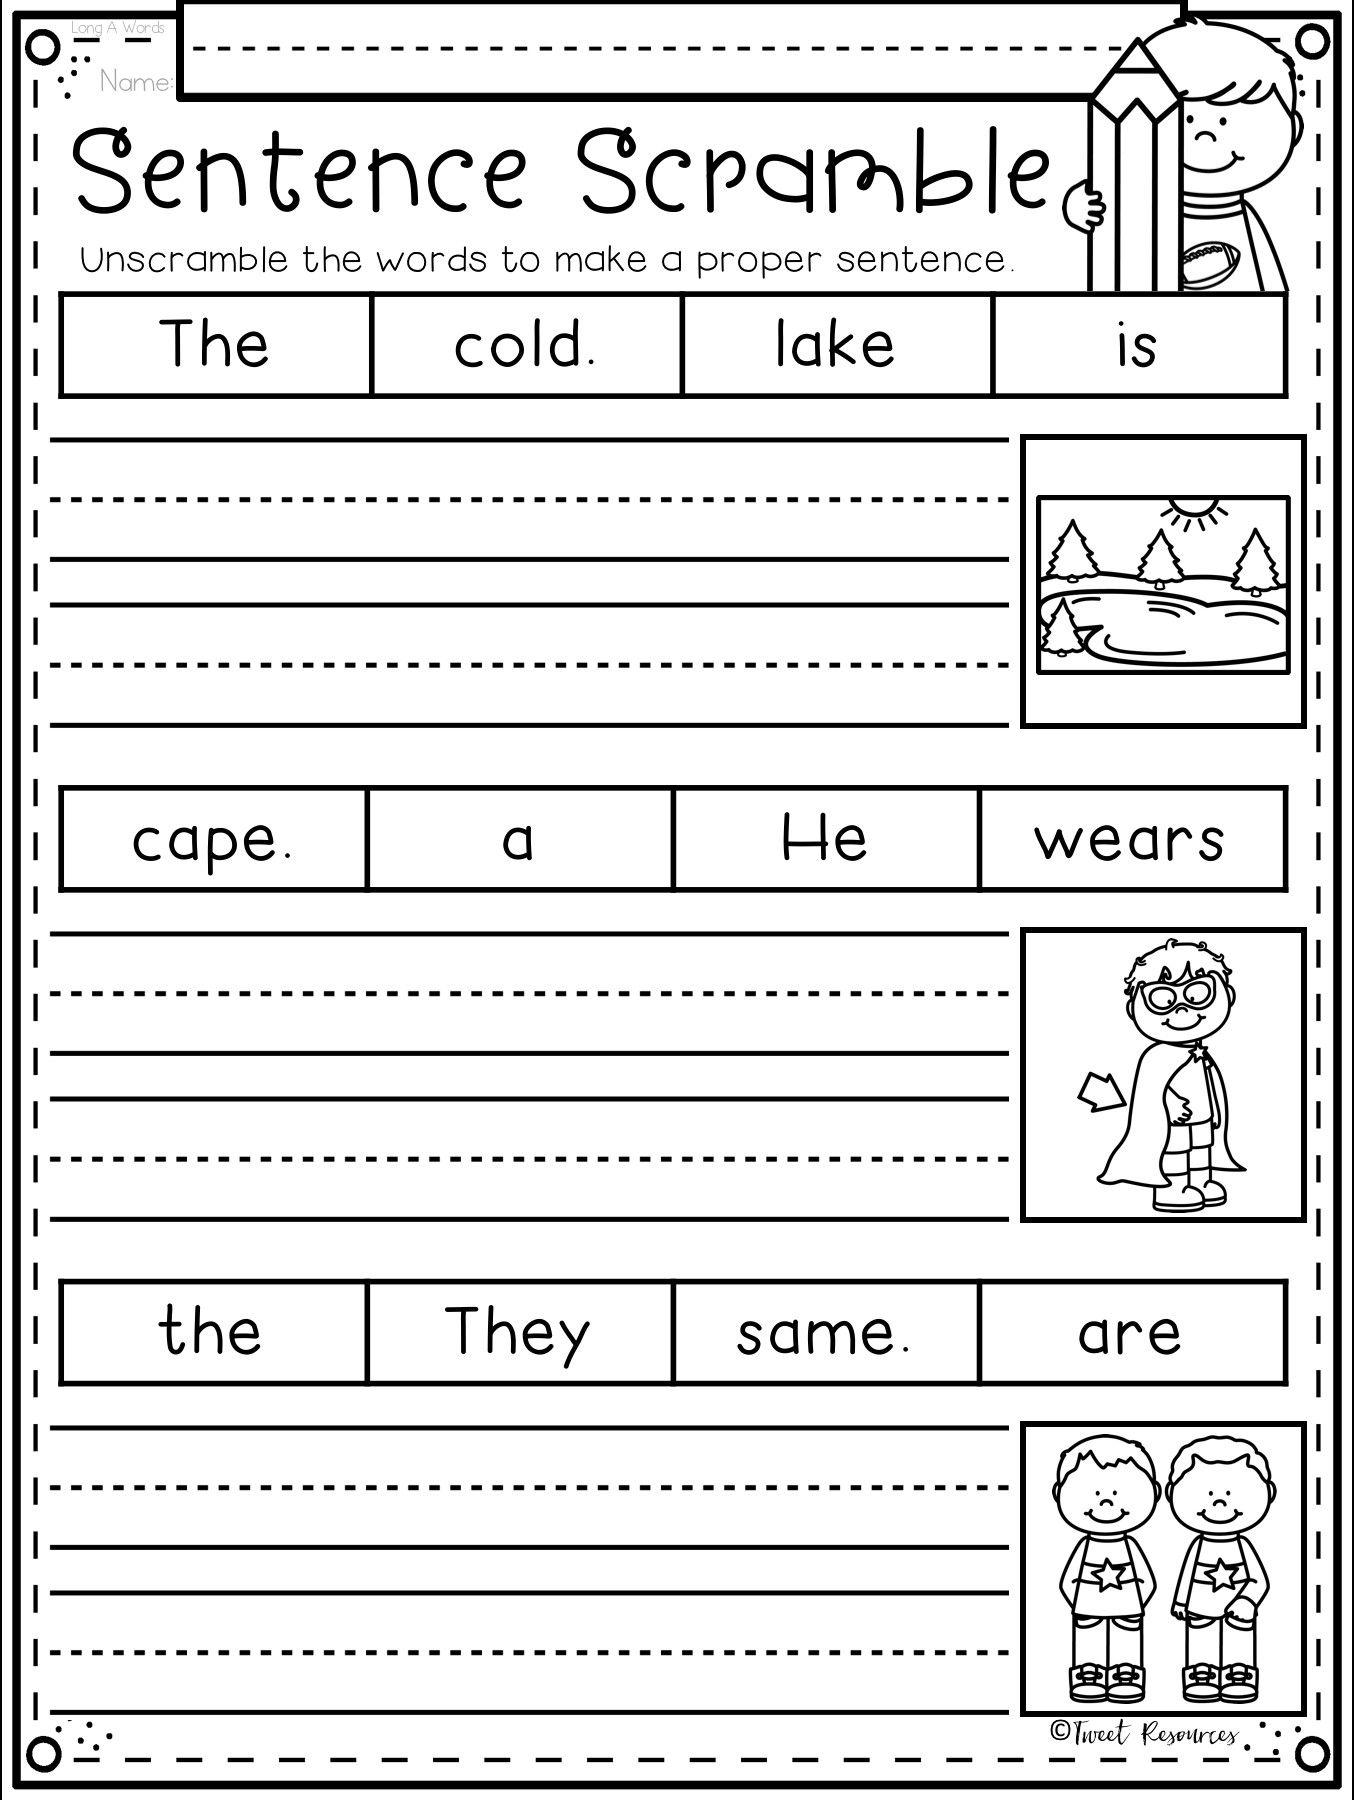 Second Grade Sentences Worksheets Ccss 2 L 1 F Worksheets Complex Sentences Worksheets Combining Sentences Paragraph Writing Worksheets